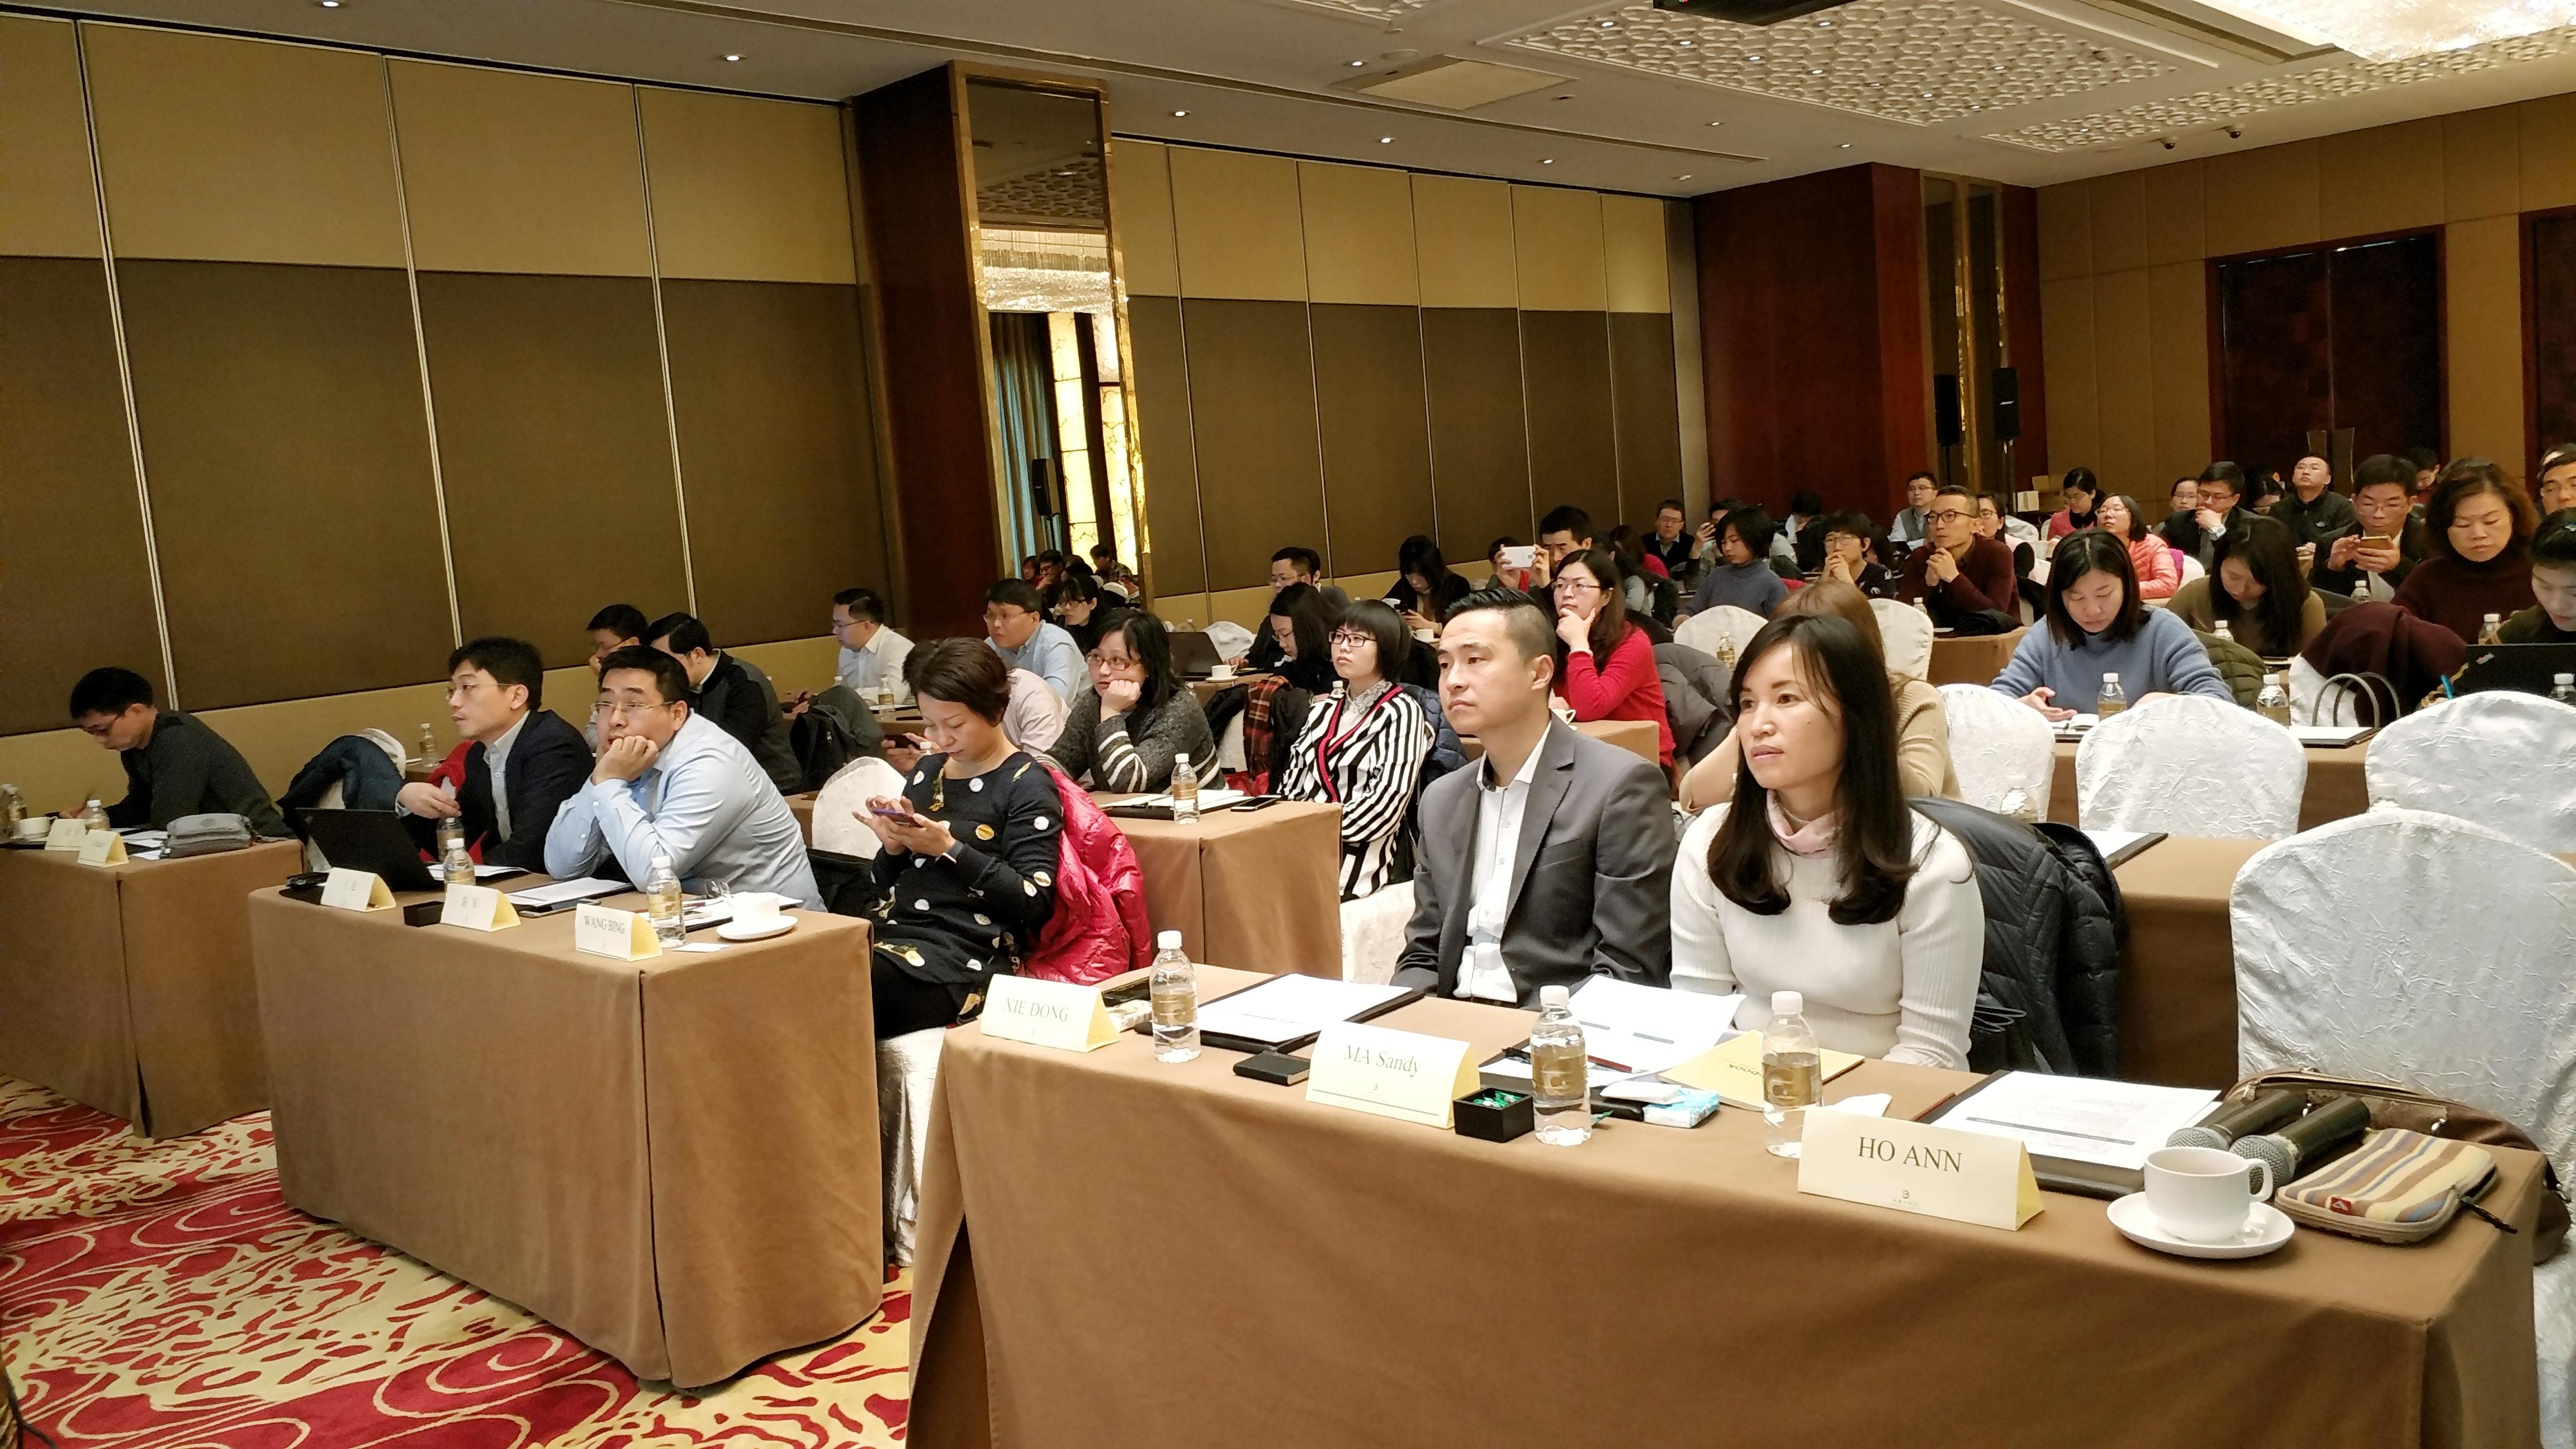 AICM 产业政策促进委员会成功举办危险化学品安全管理研讨会暨分委会会议